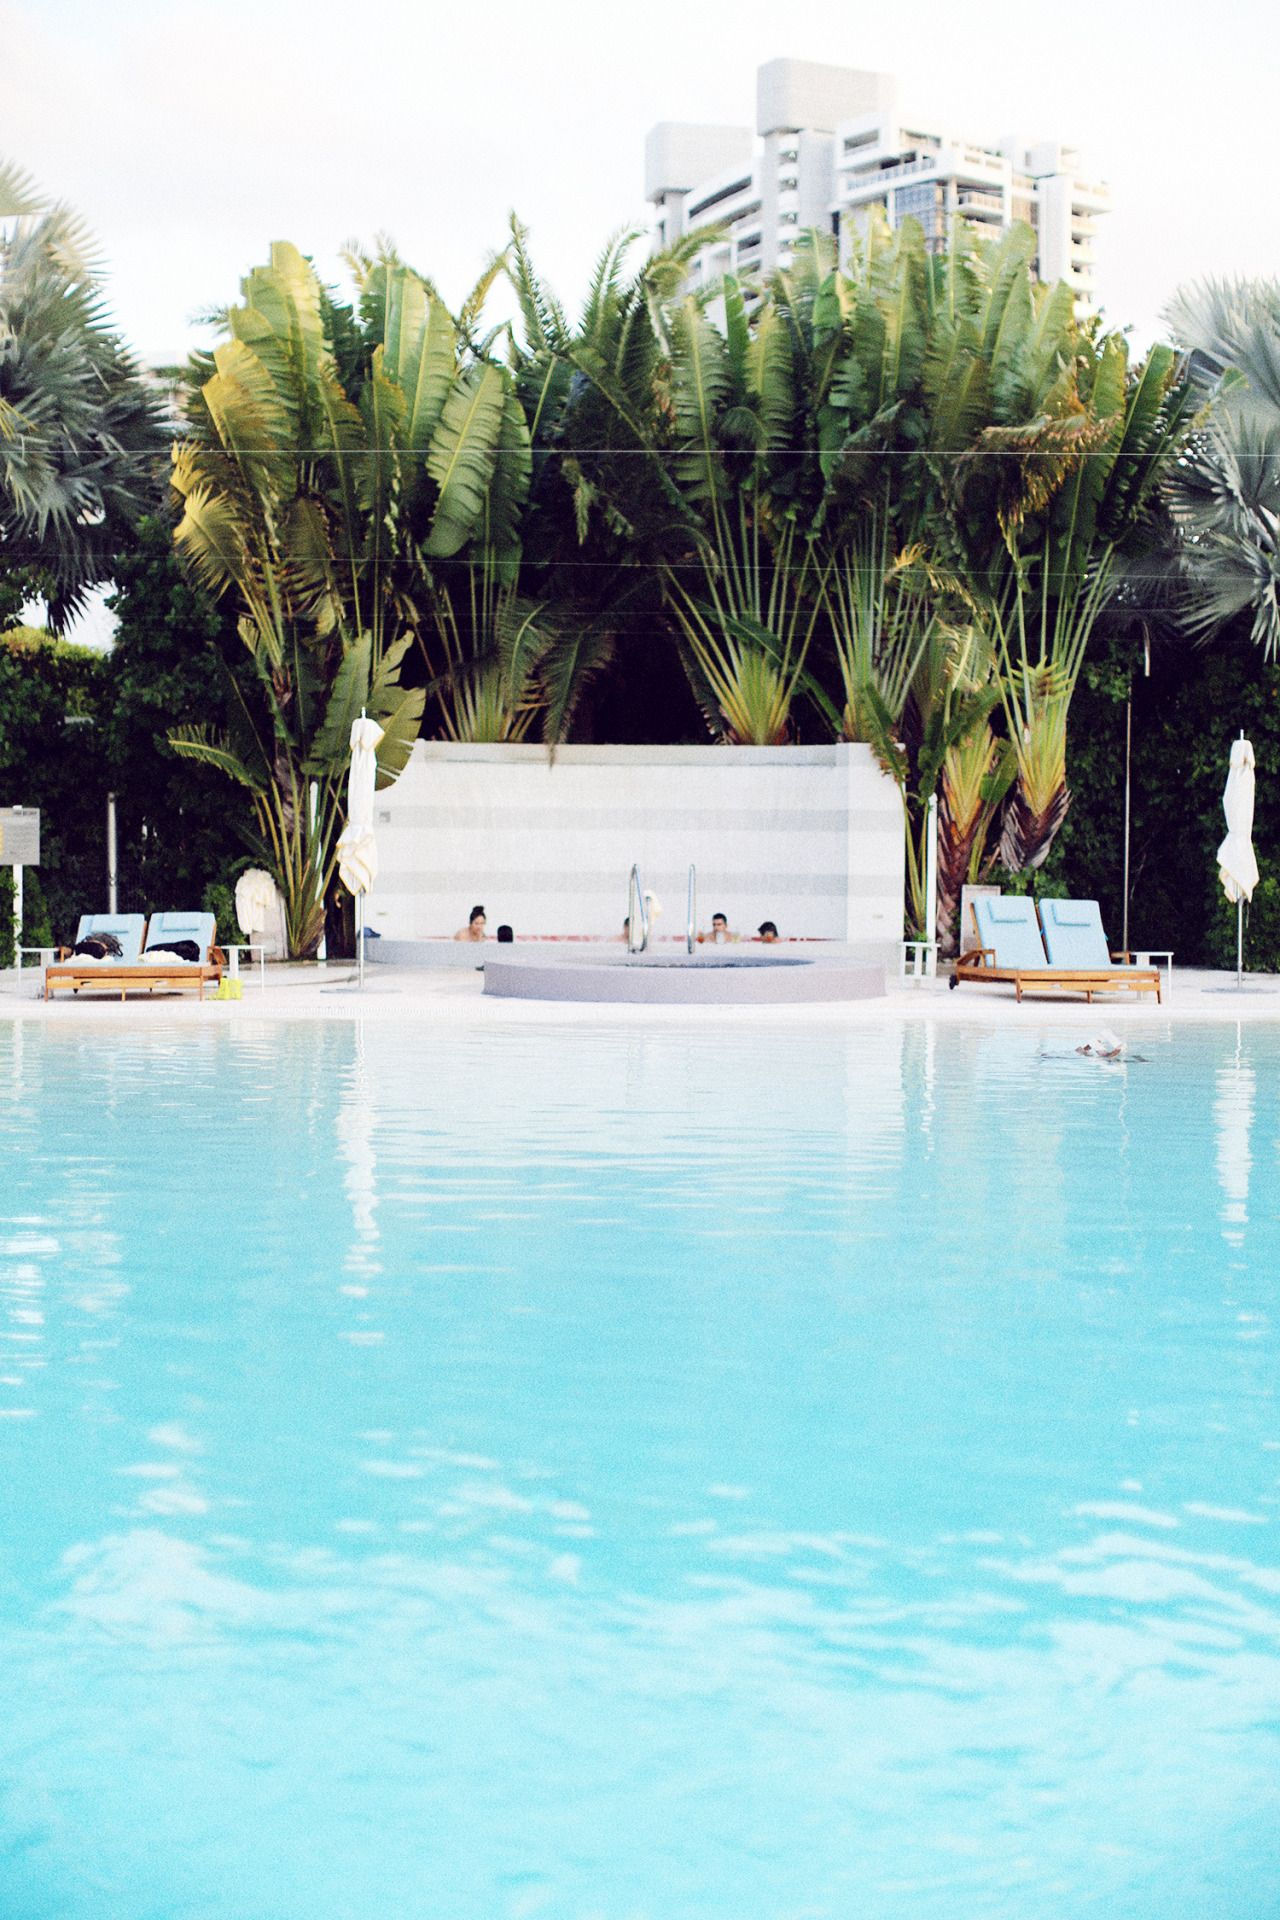 Turquoise pool and palms, The Standard Miami. Miami